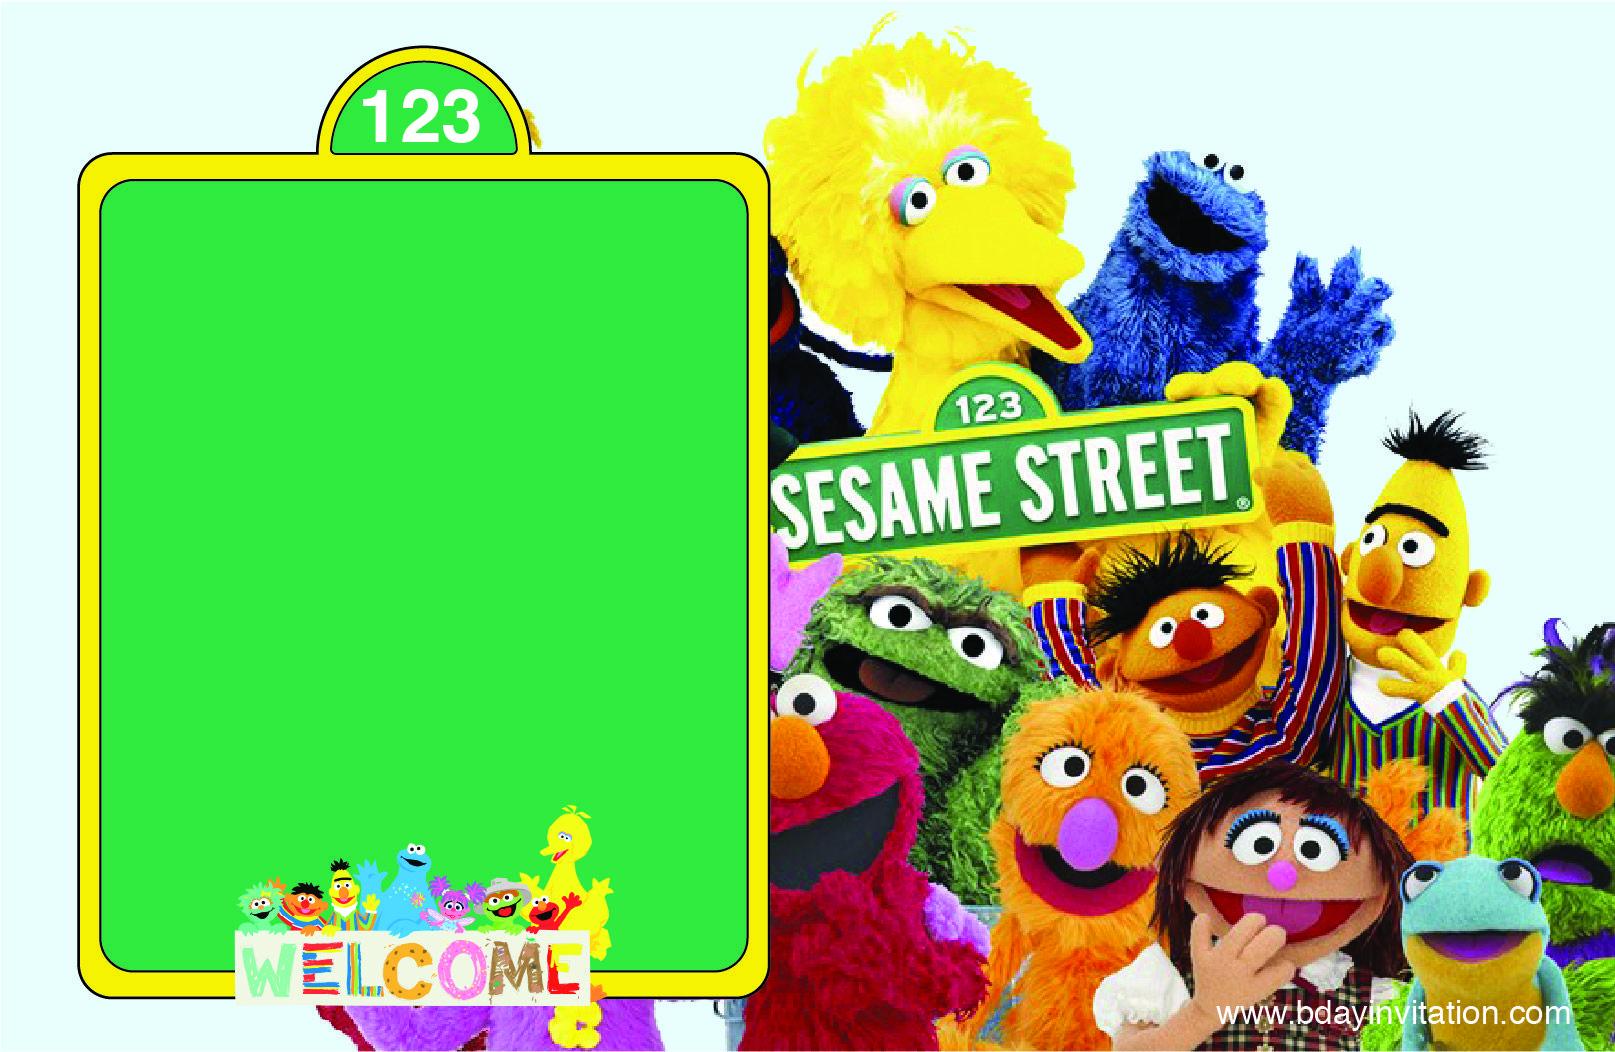 10 x sesame street birthday party